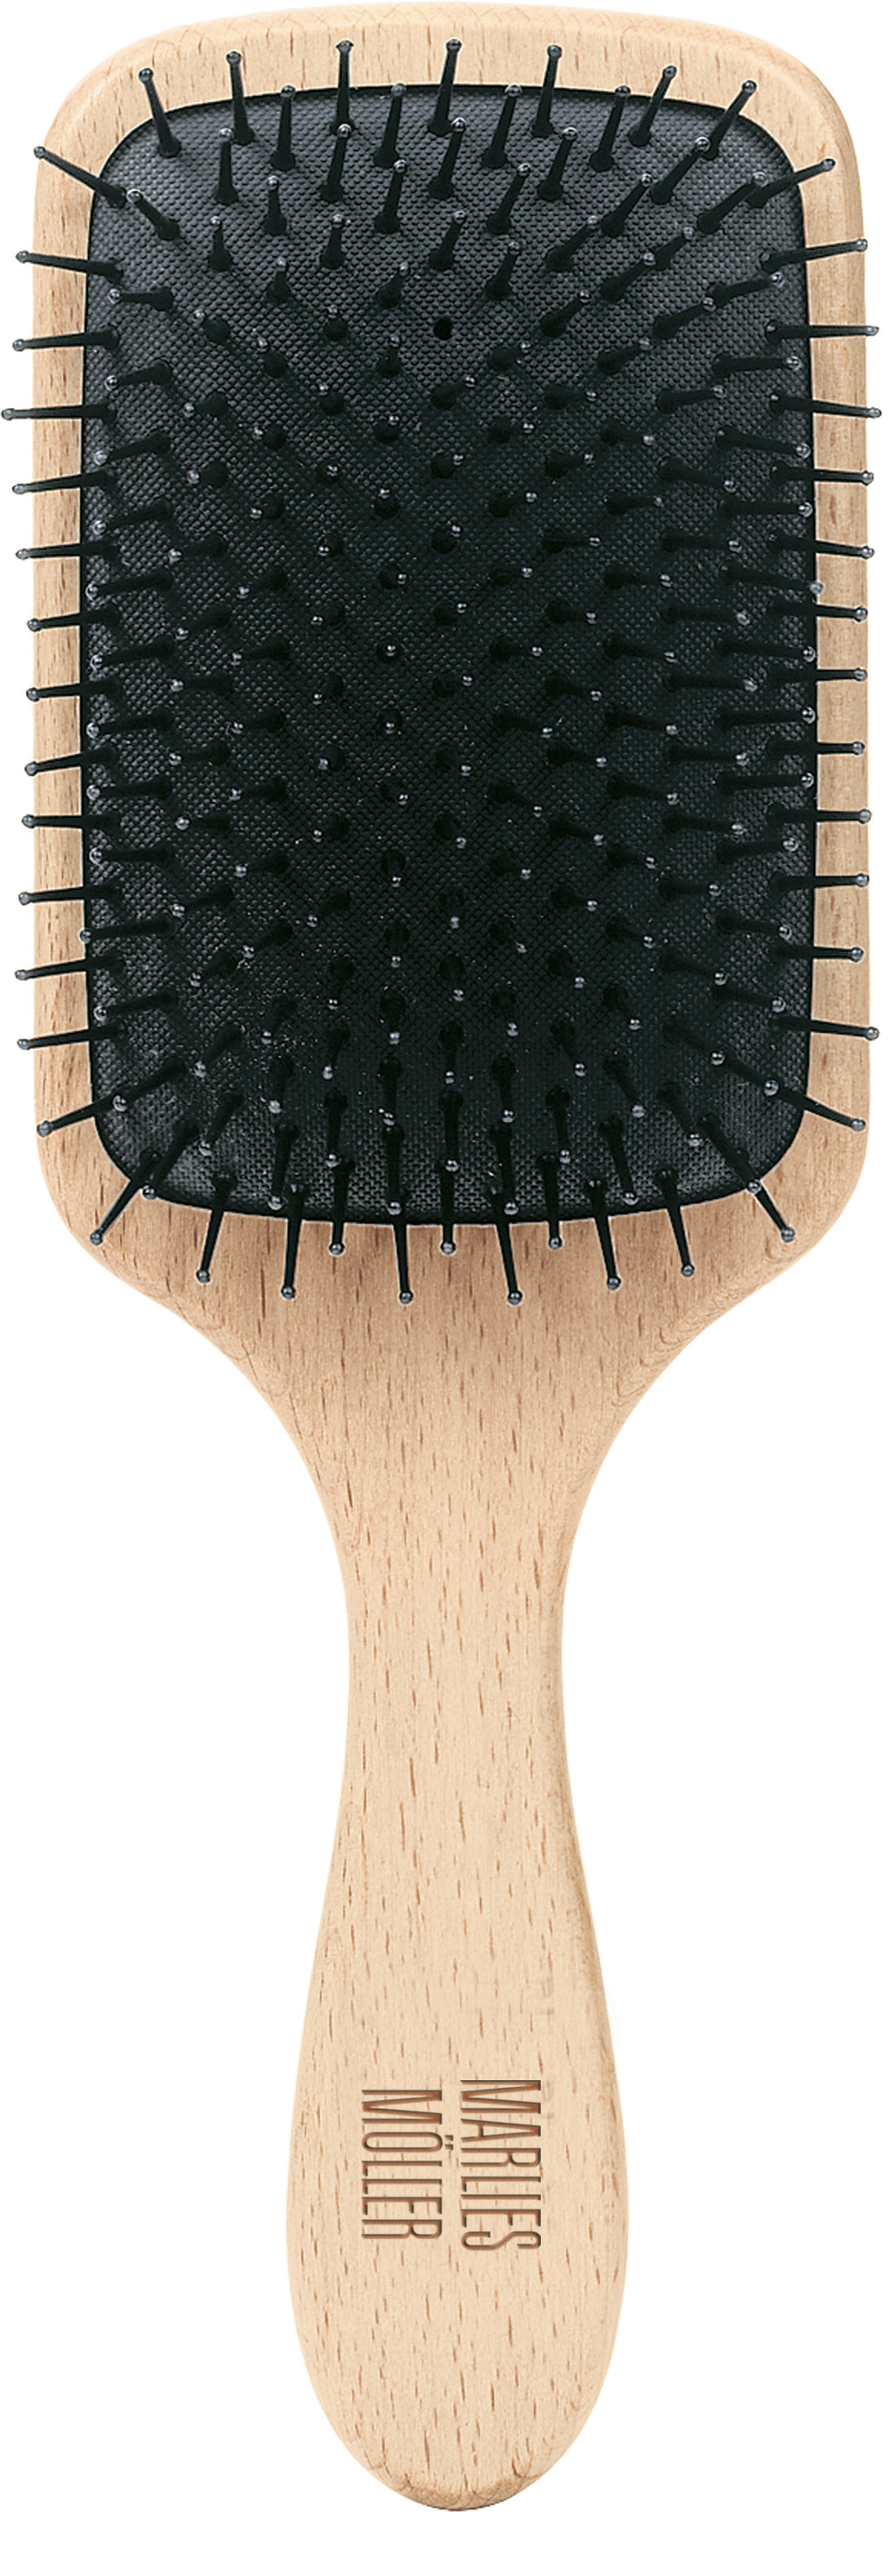 Marlies Möller Brush  Classic Haar und Kopfhaut Bürste